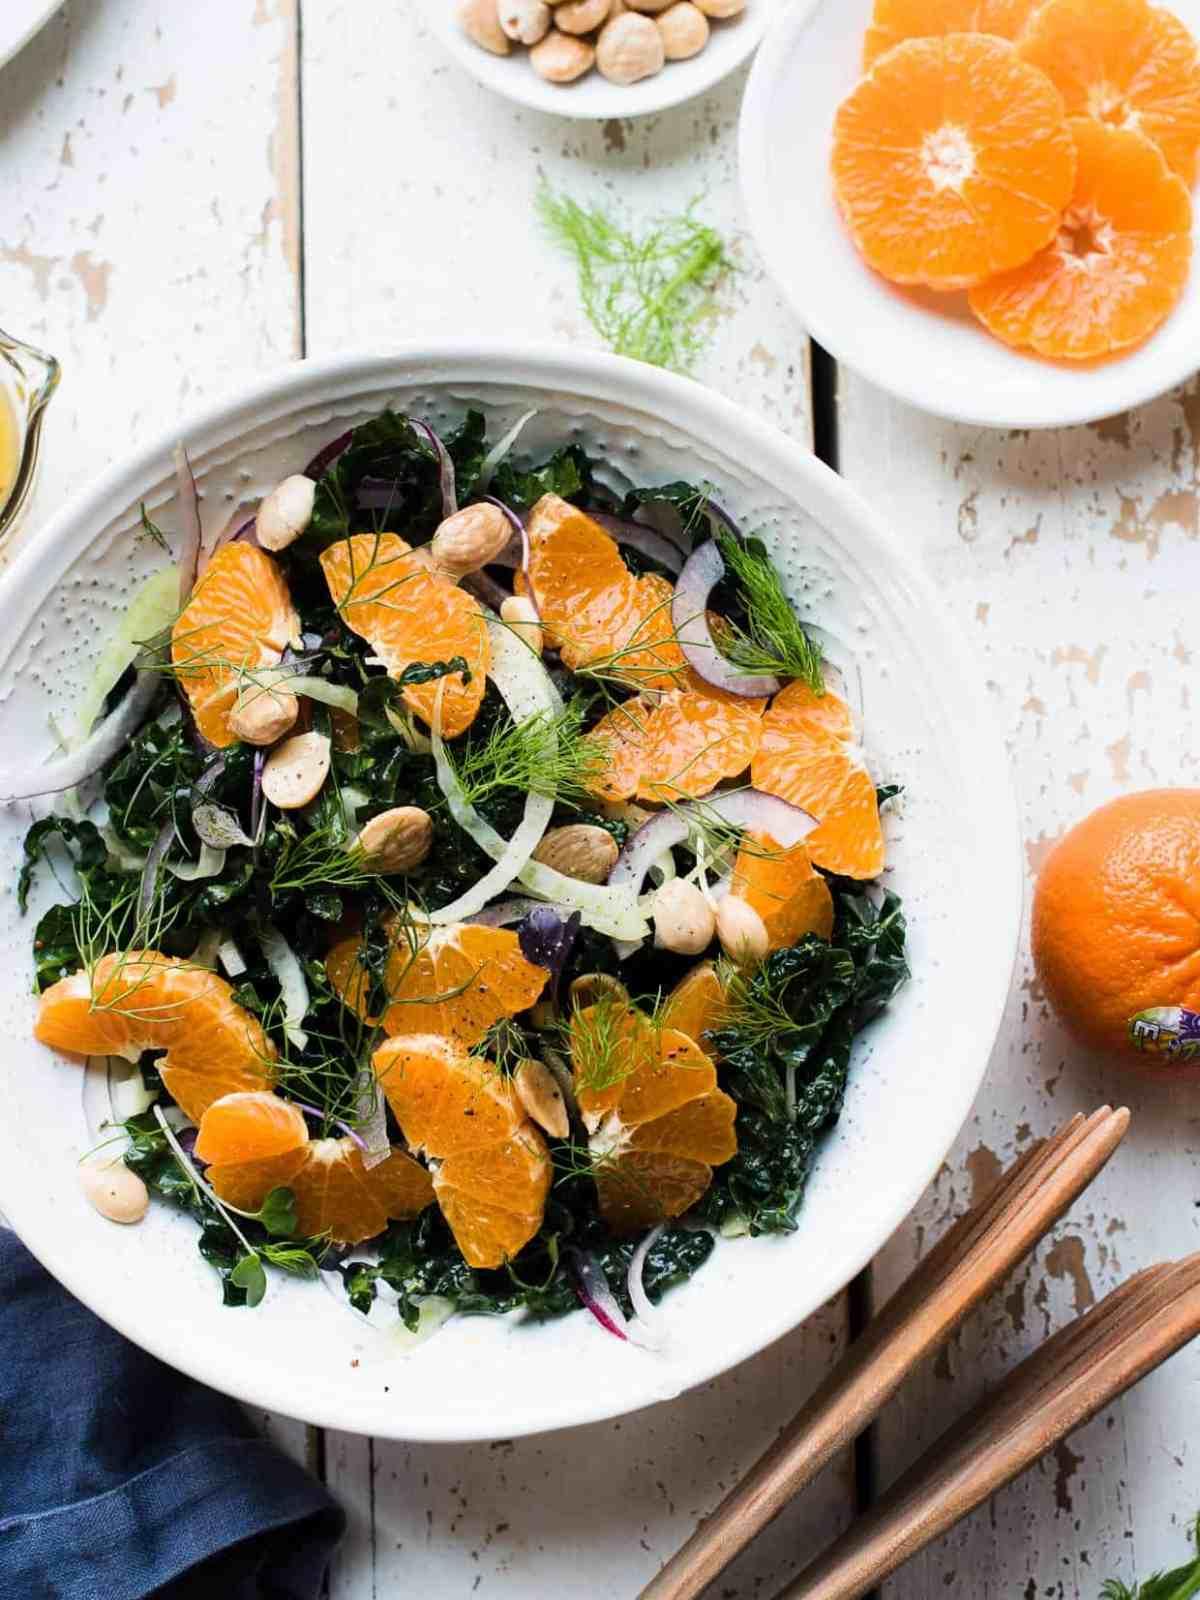 Over head shot of mandarin orange kale salad with salad tongs on the side.